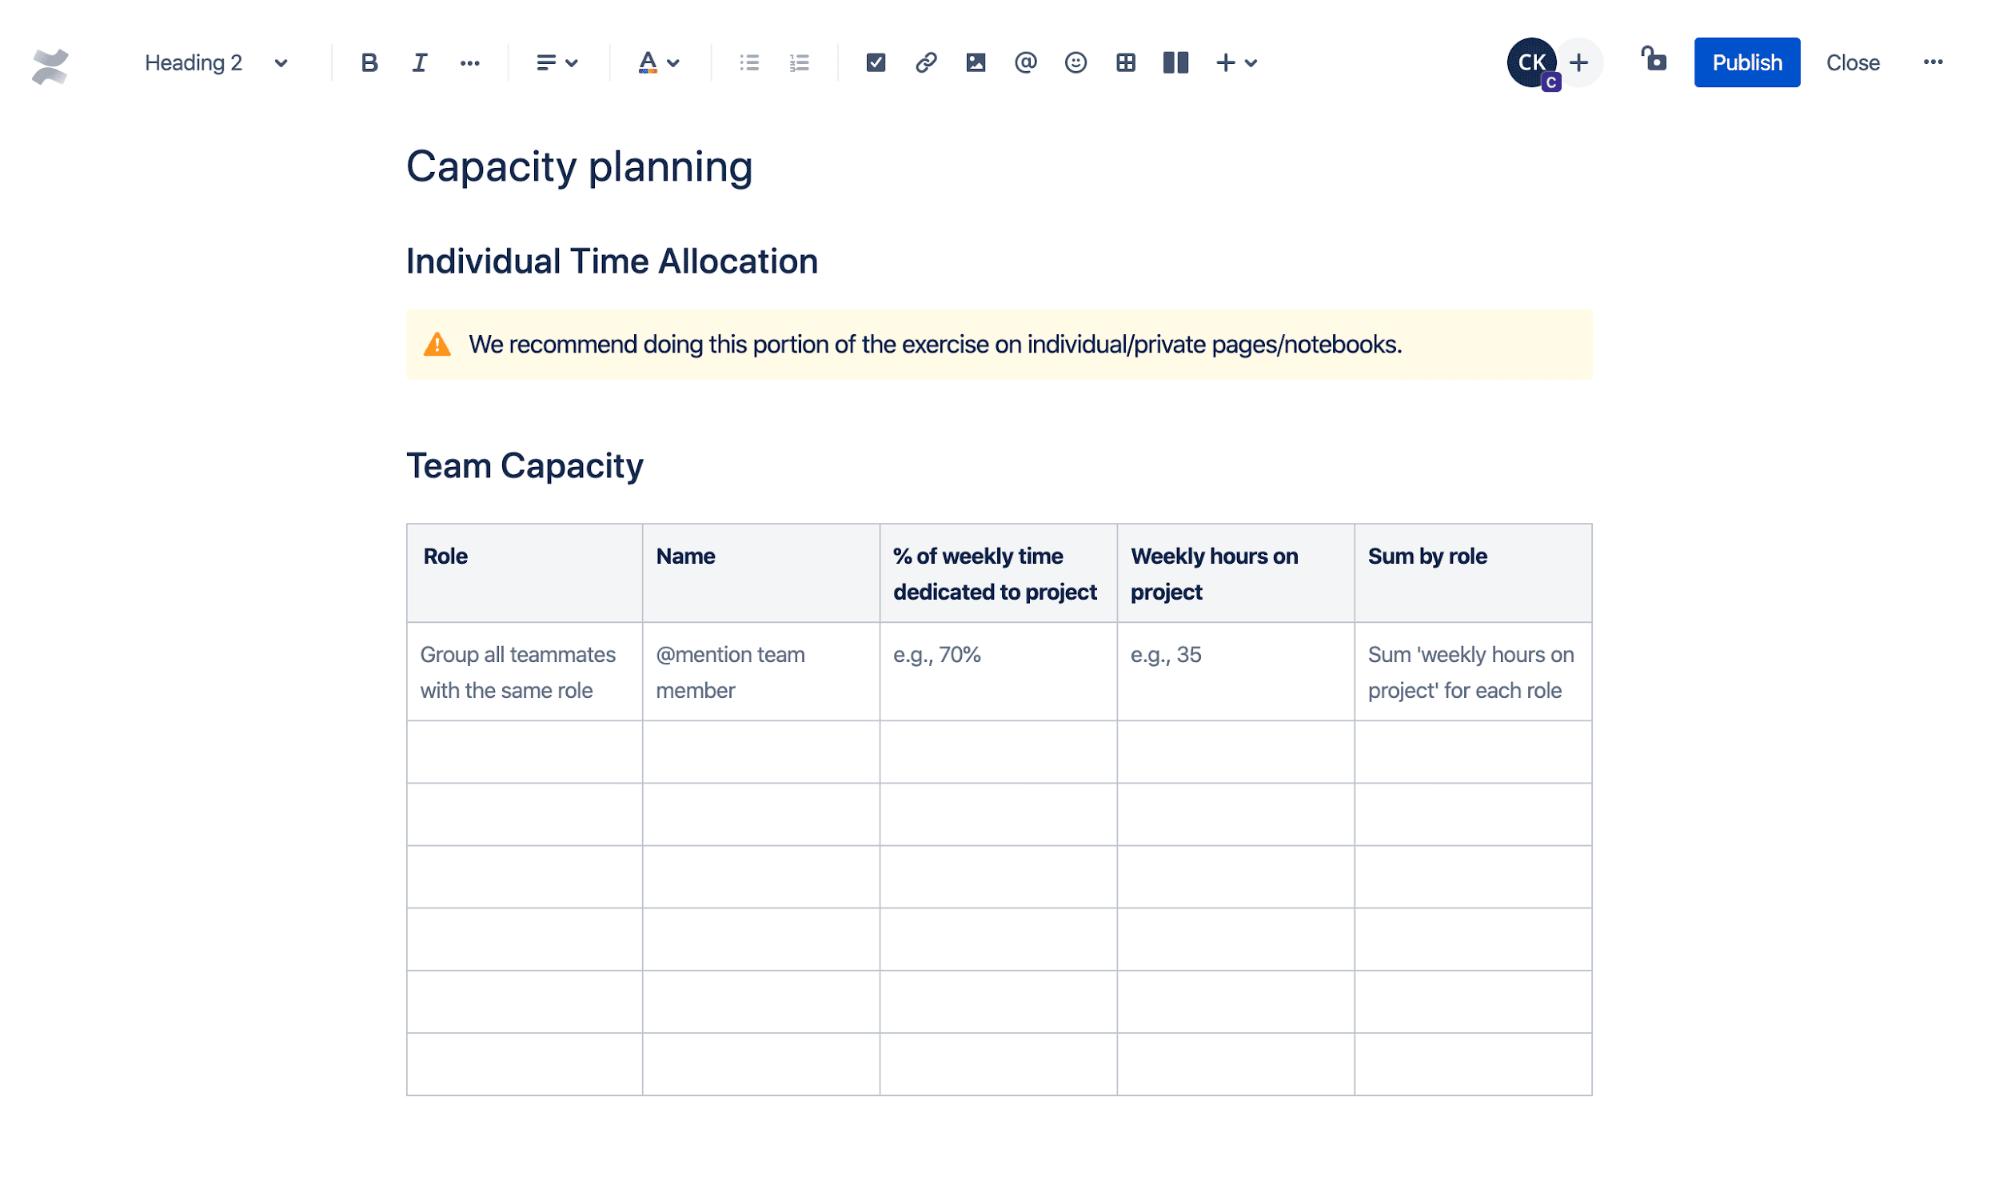 Capacity planning document